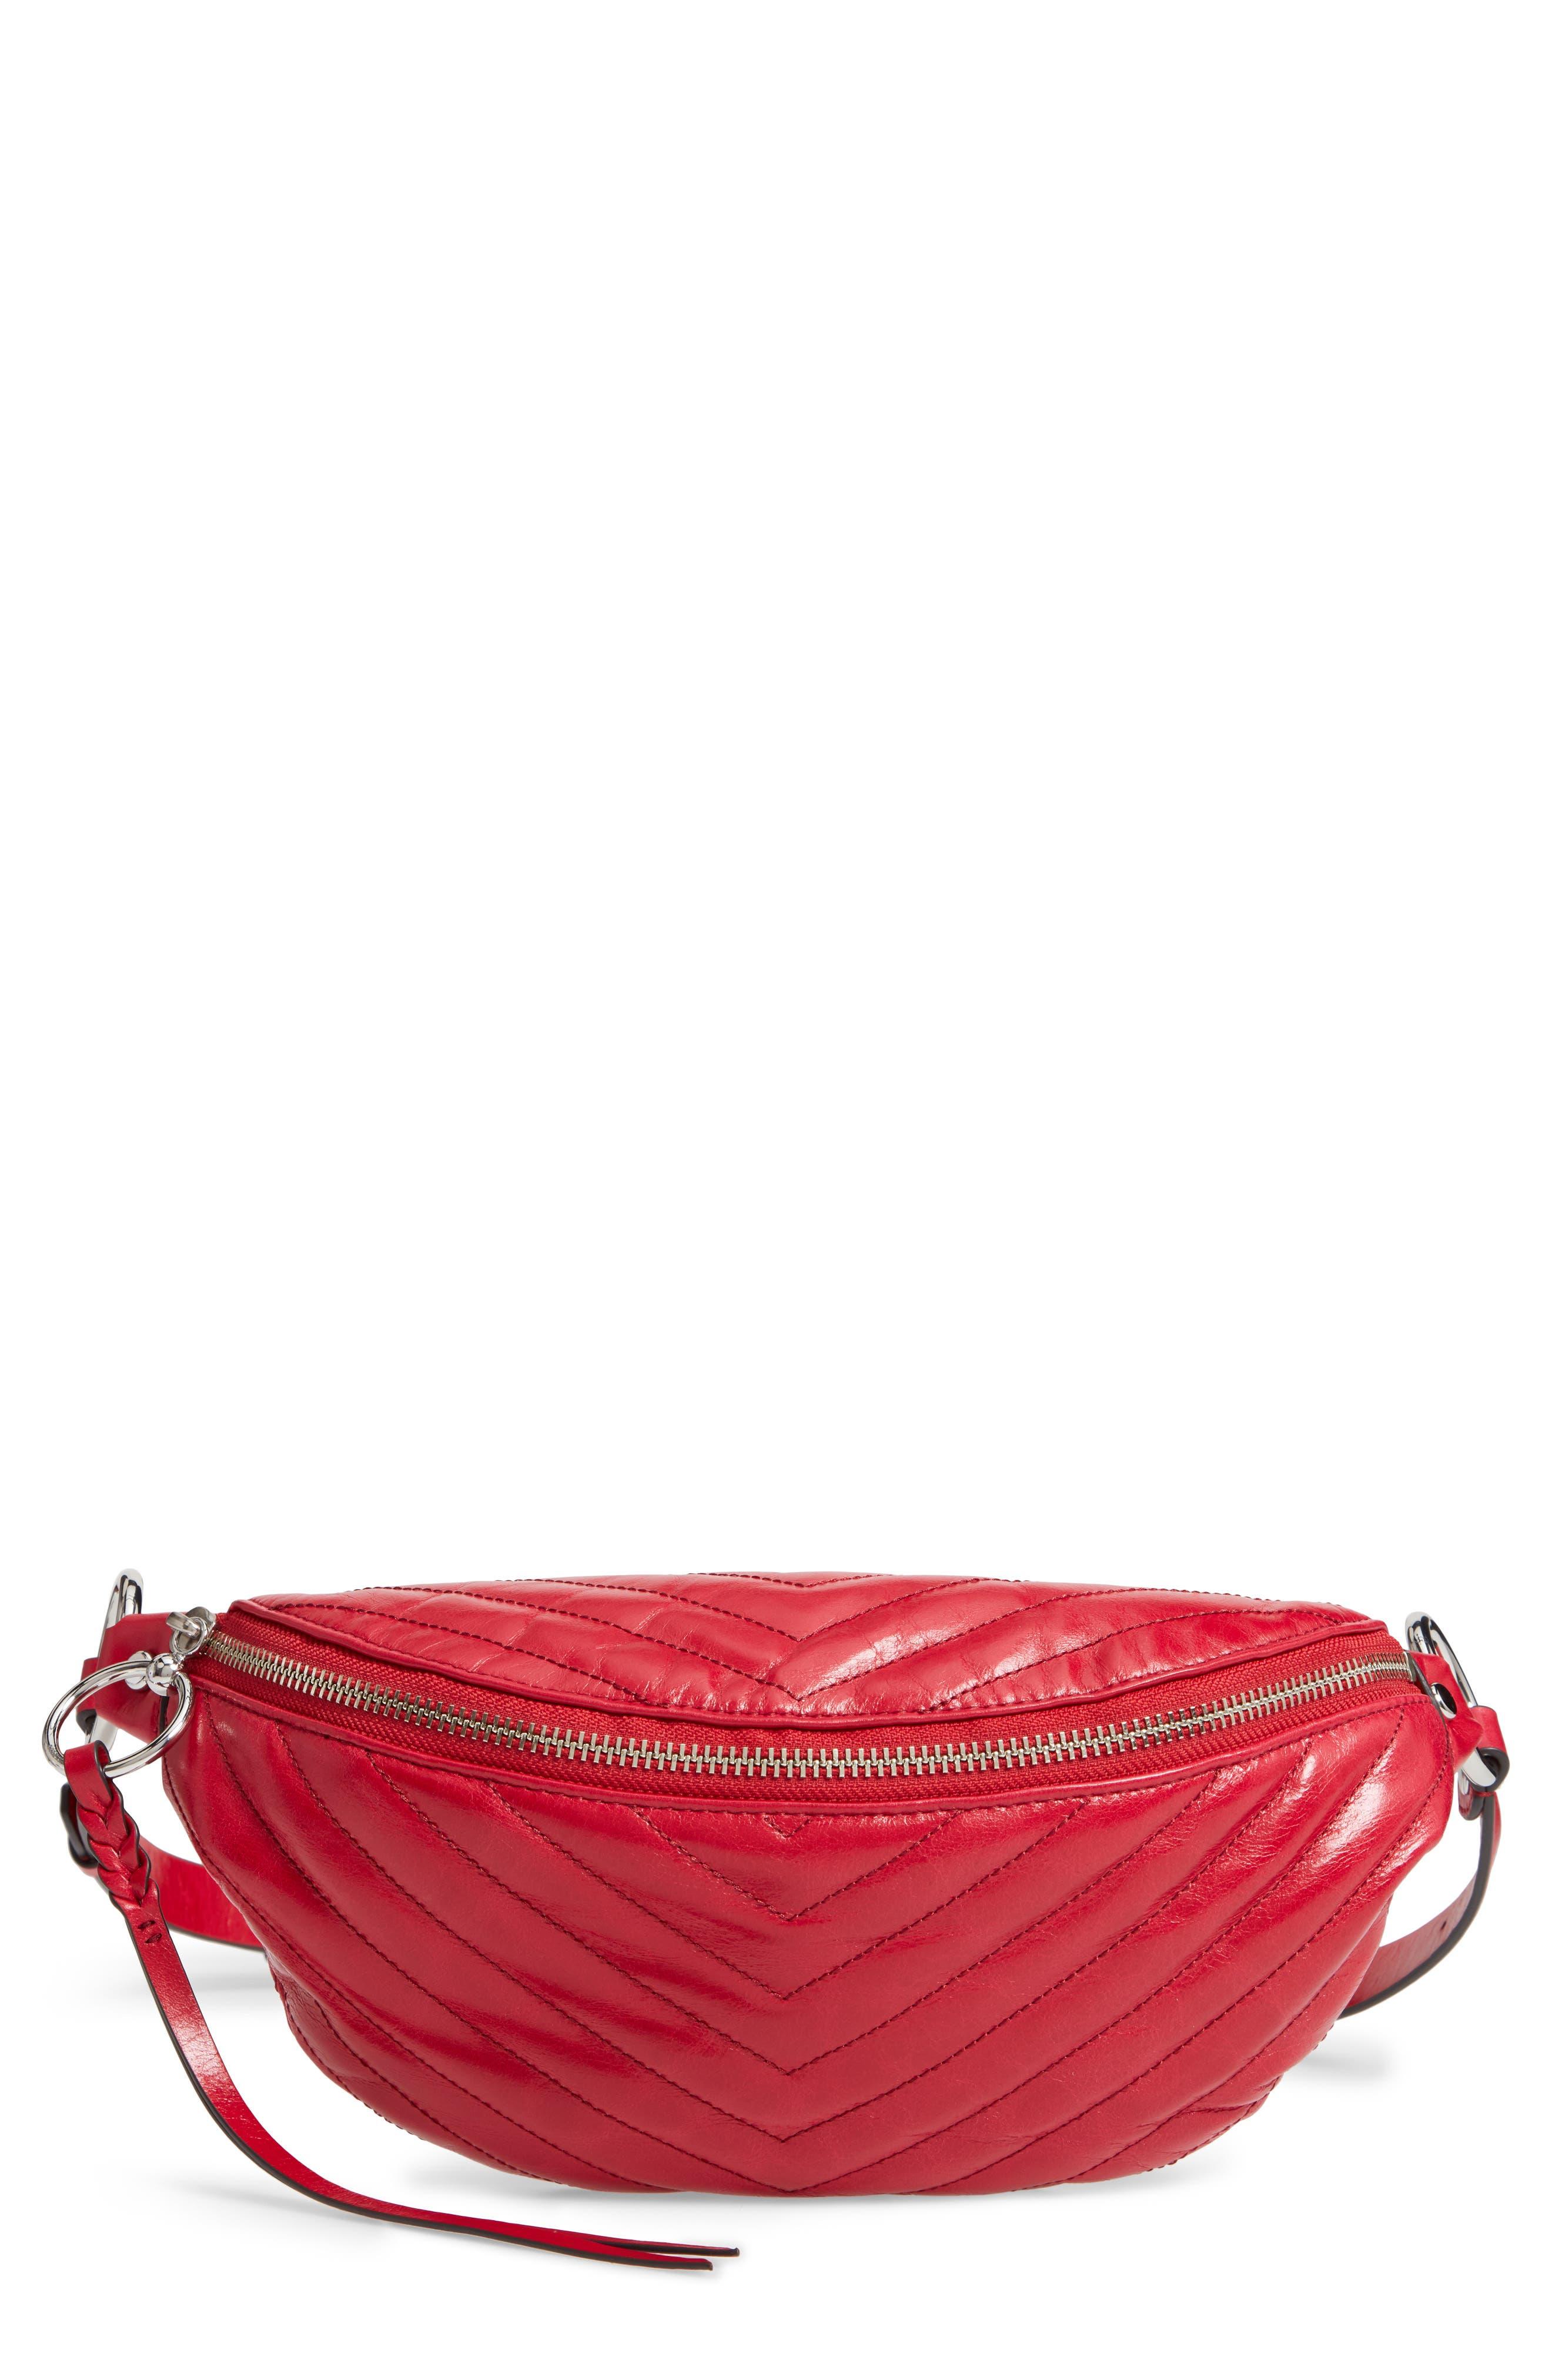 Edie Leather Belt Bag,                             Main thumbnail 1, color,                             SCARLET